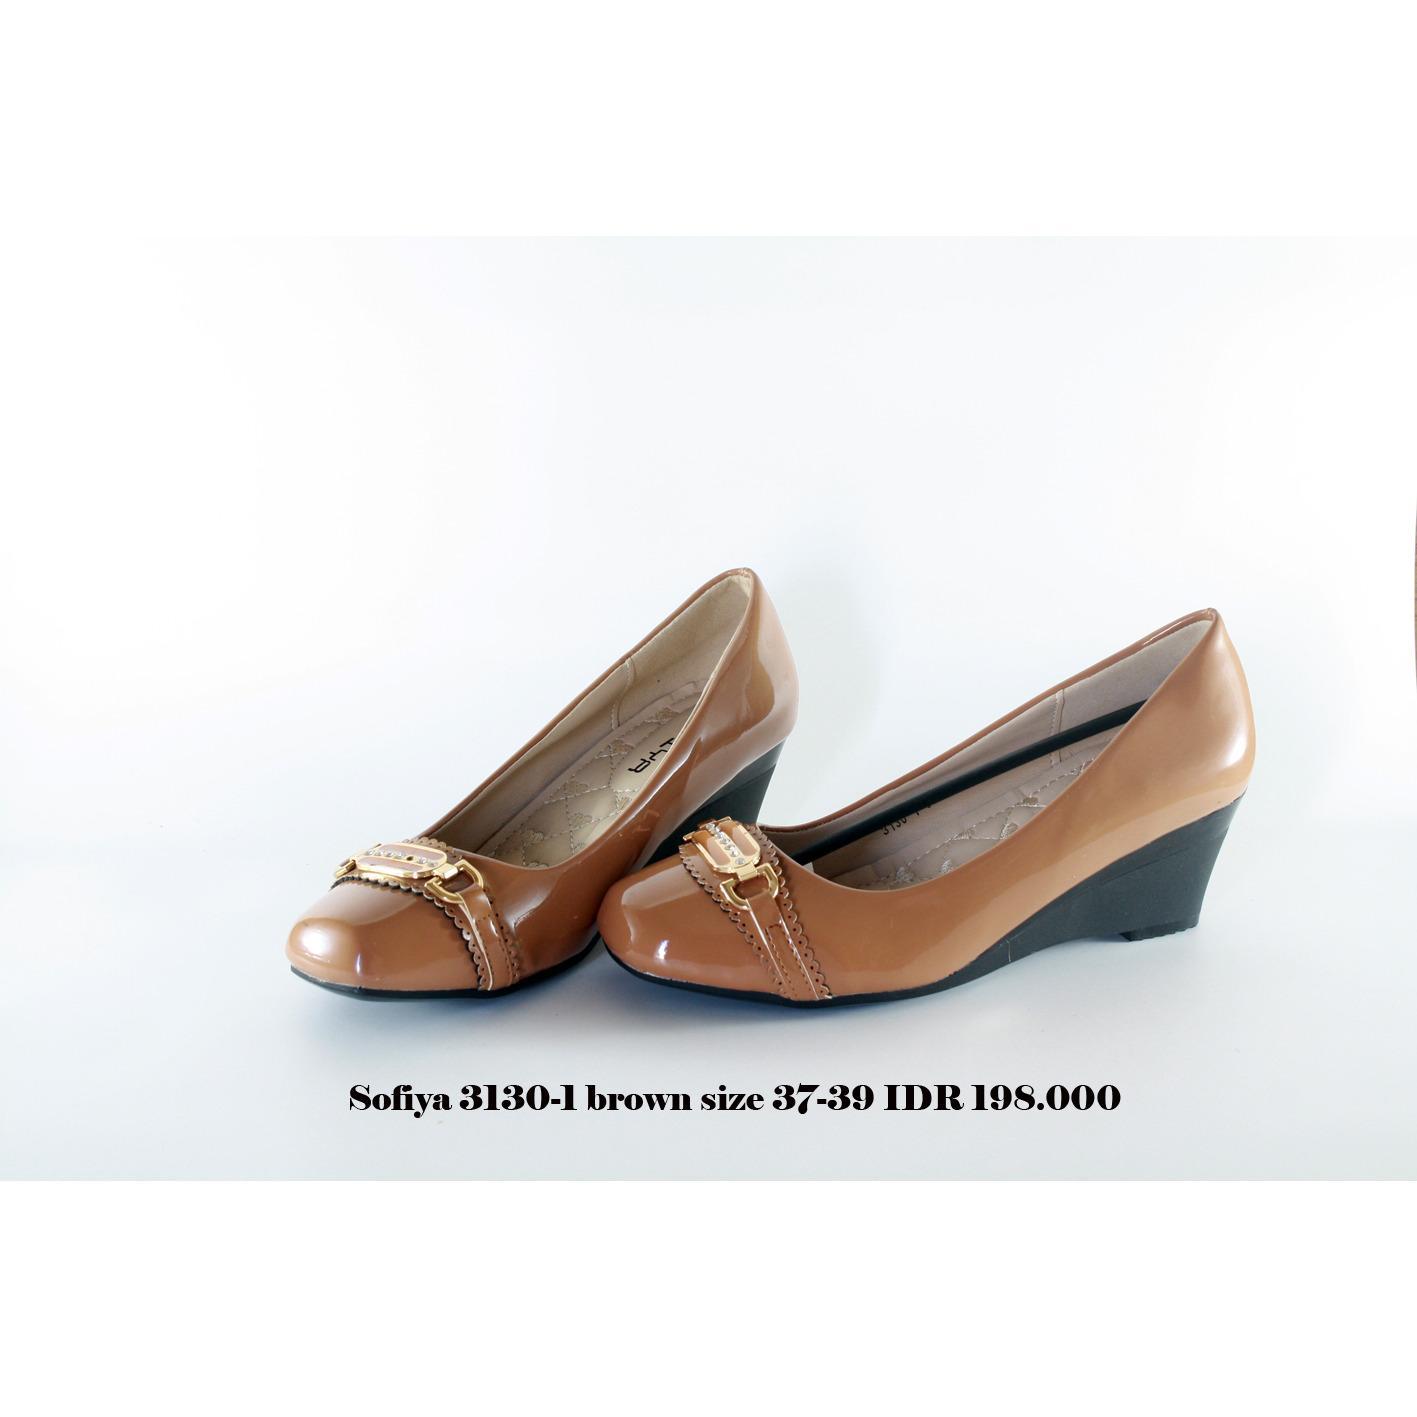 sofiya 3130-1 sepatu wedges wanita coklat